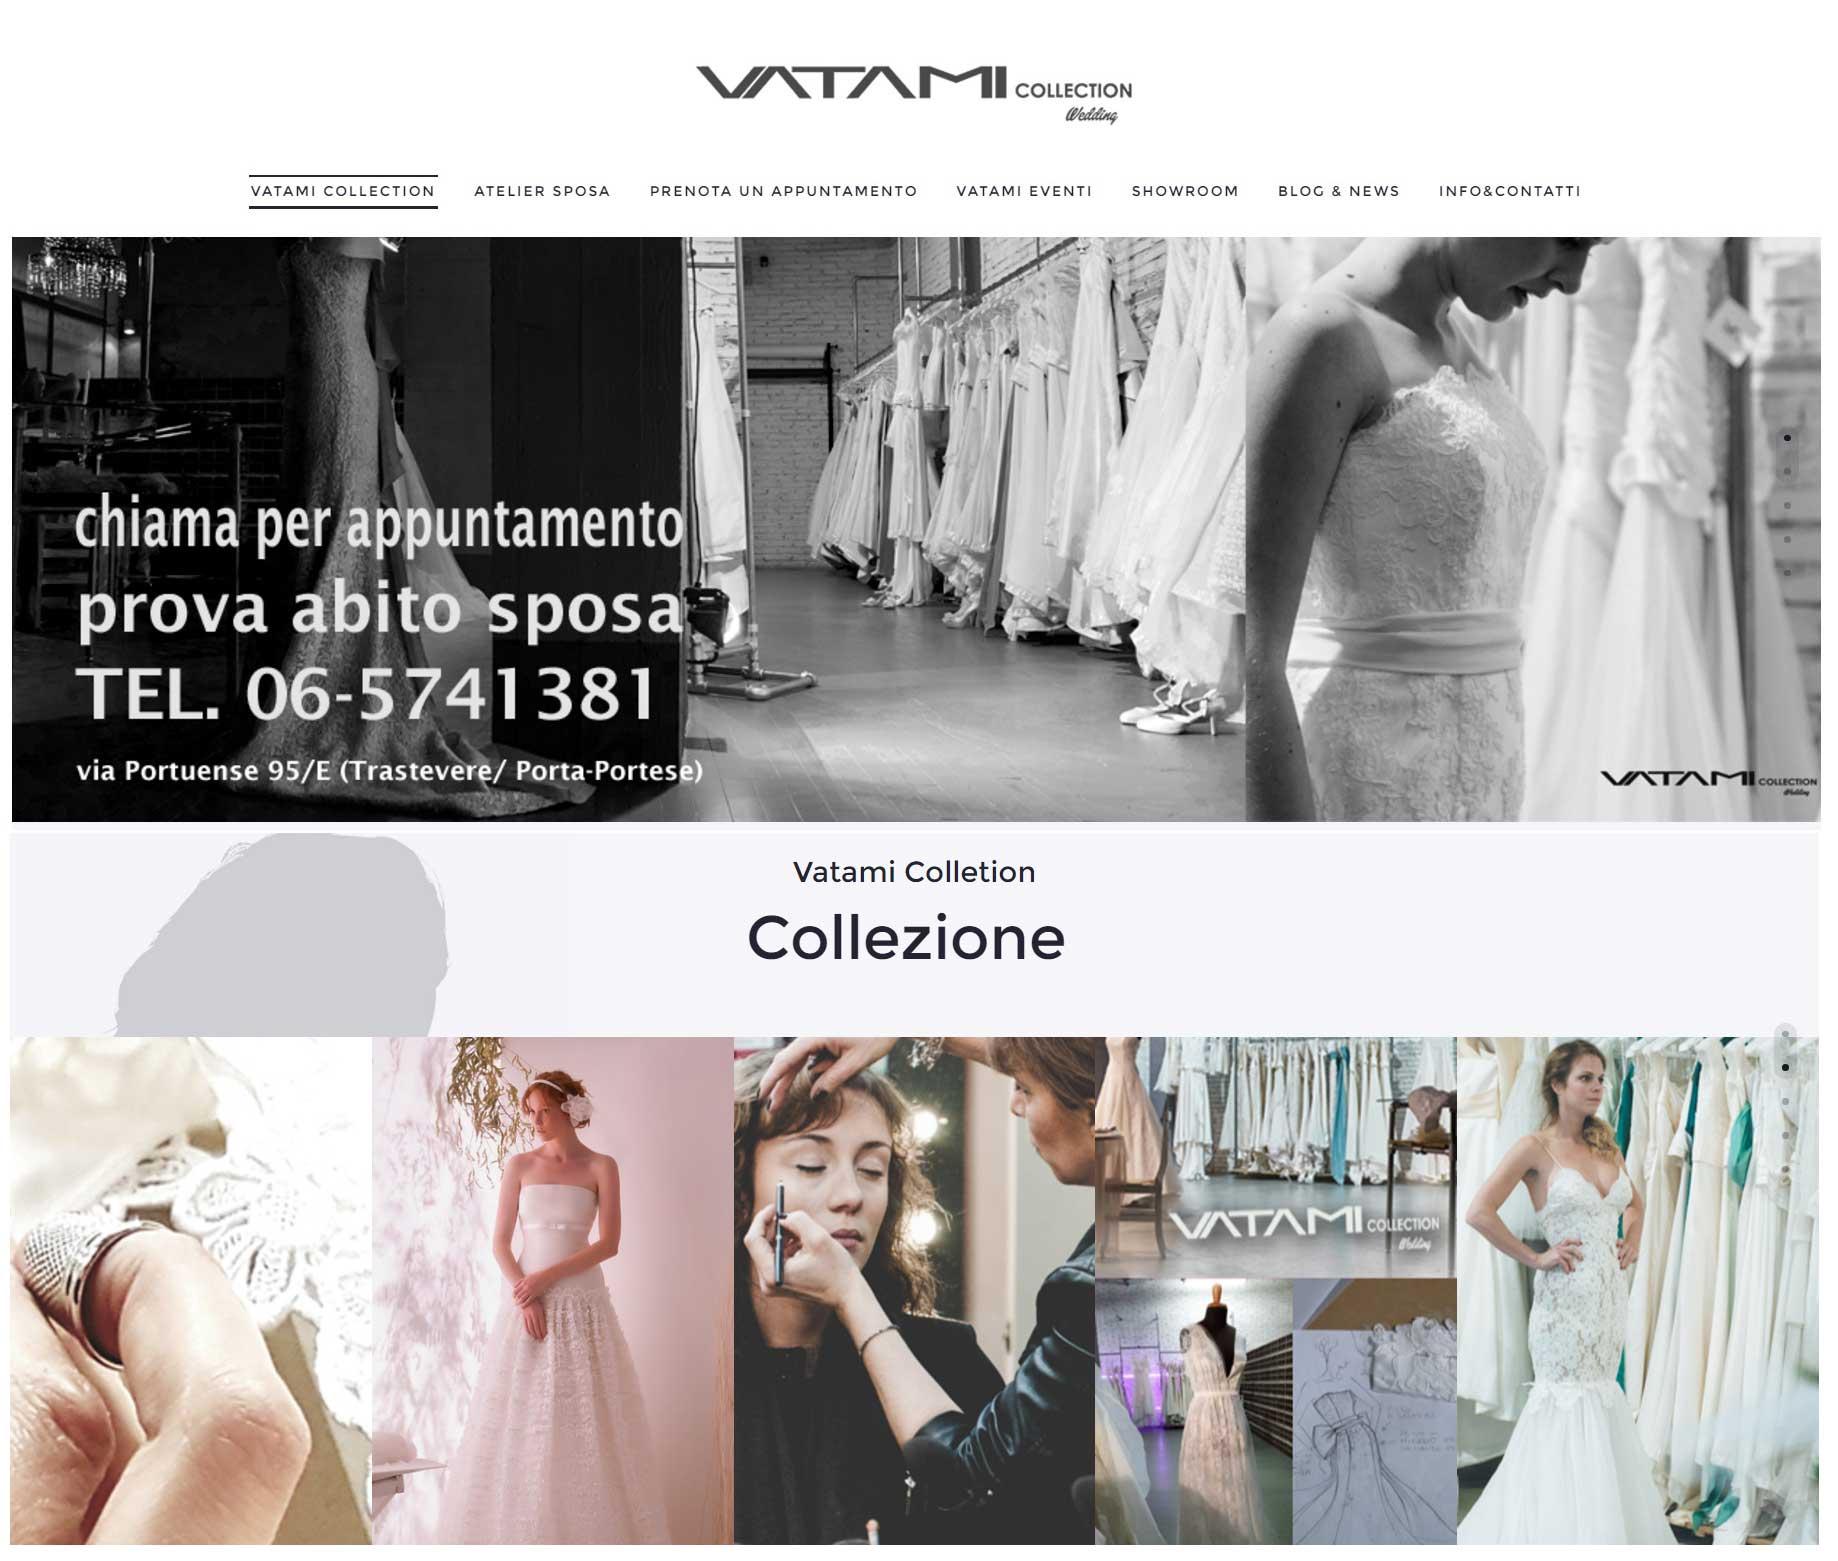 Vatami Collection